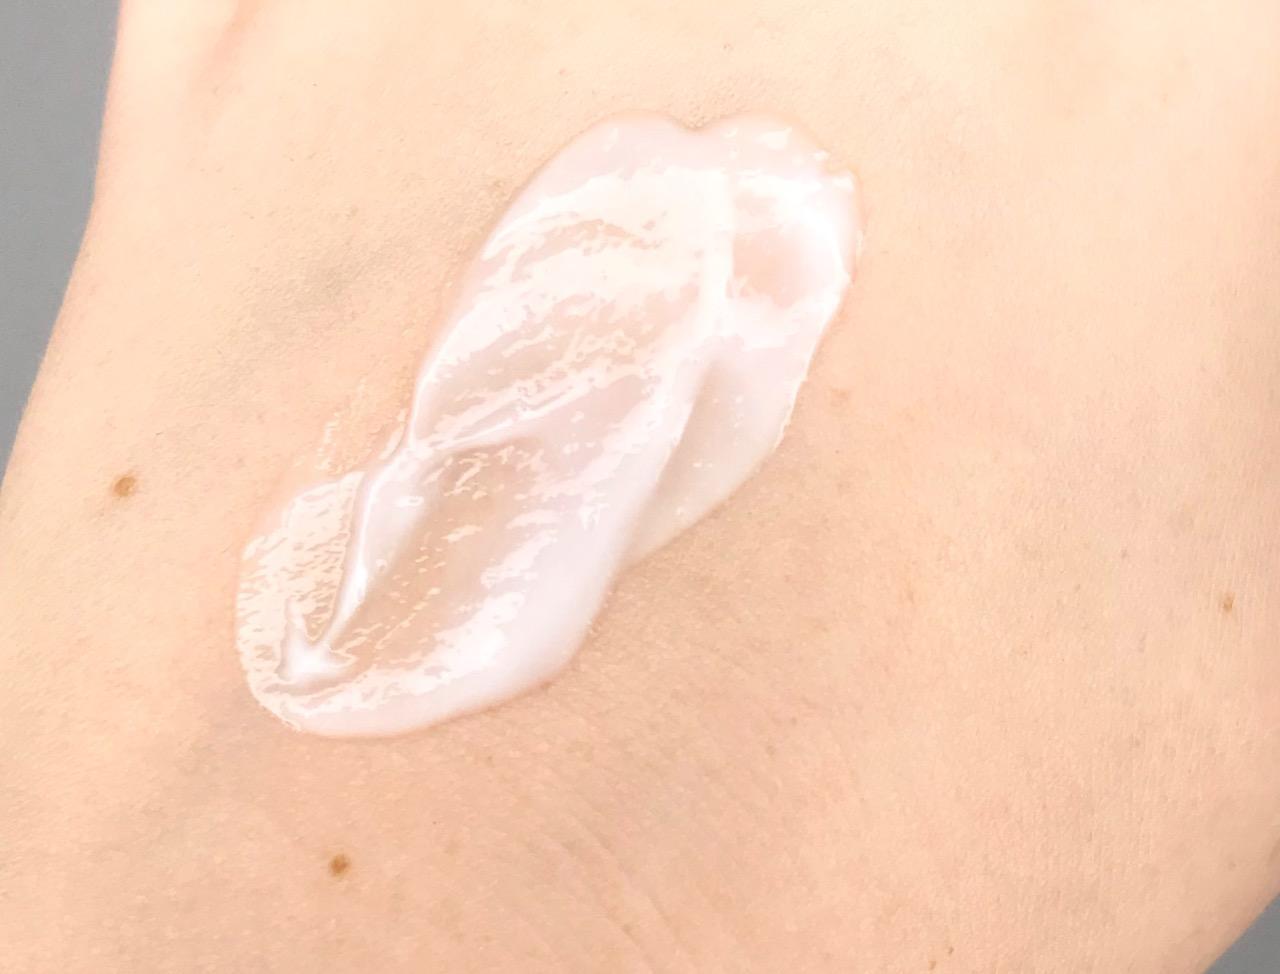 Isana Med Akut Pflege Serum mit Urea Textur